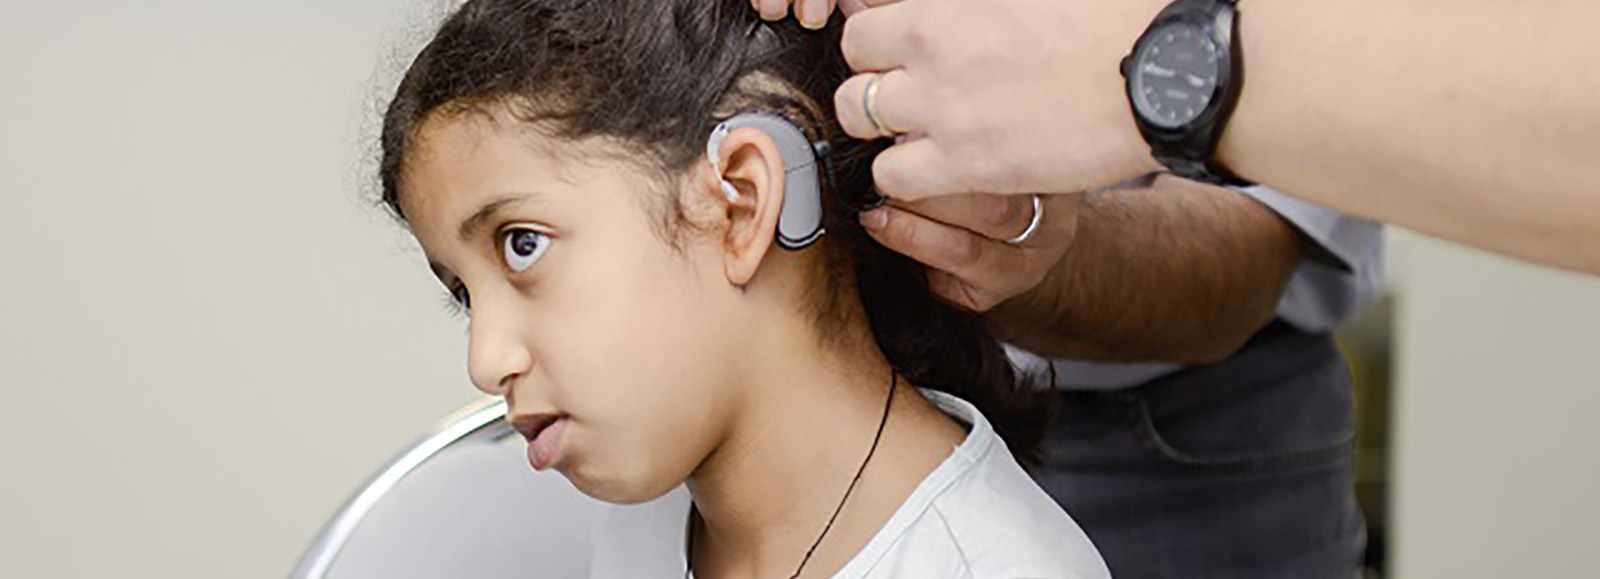 Cochlea Implantat Kind